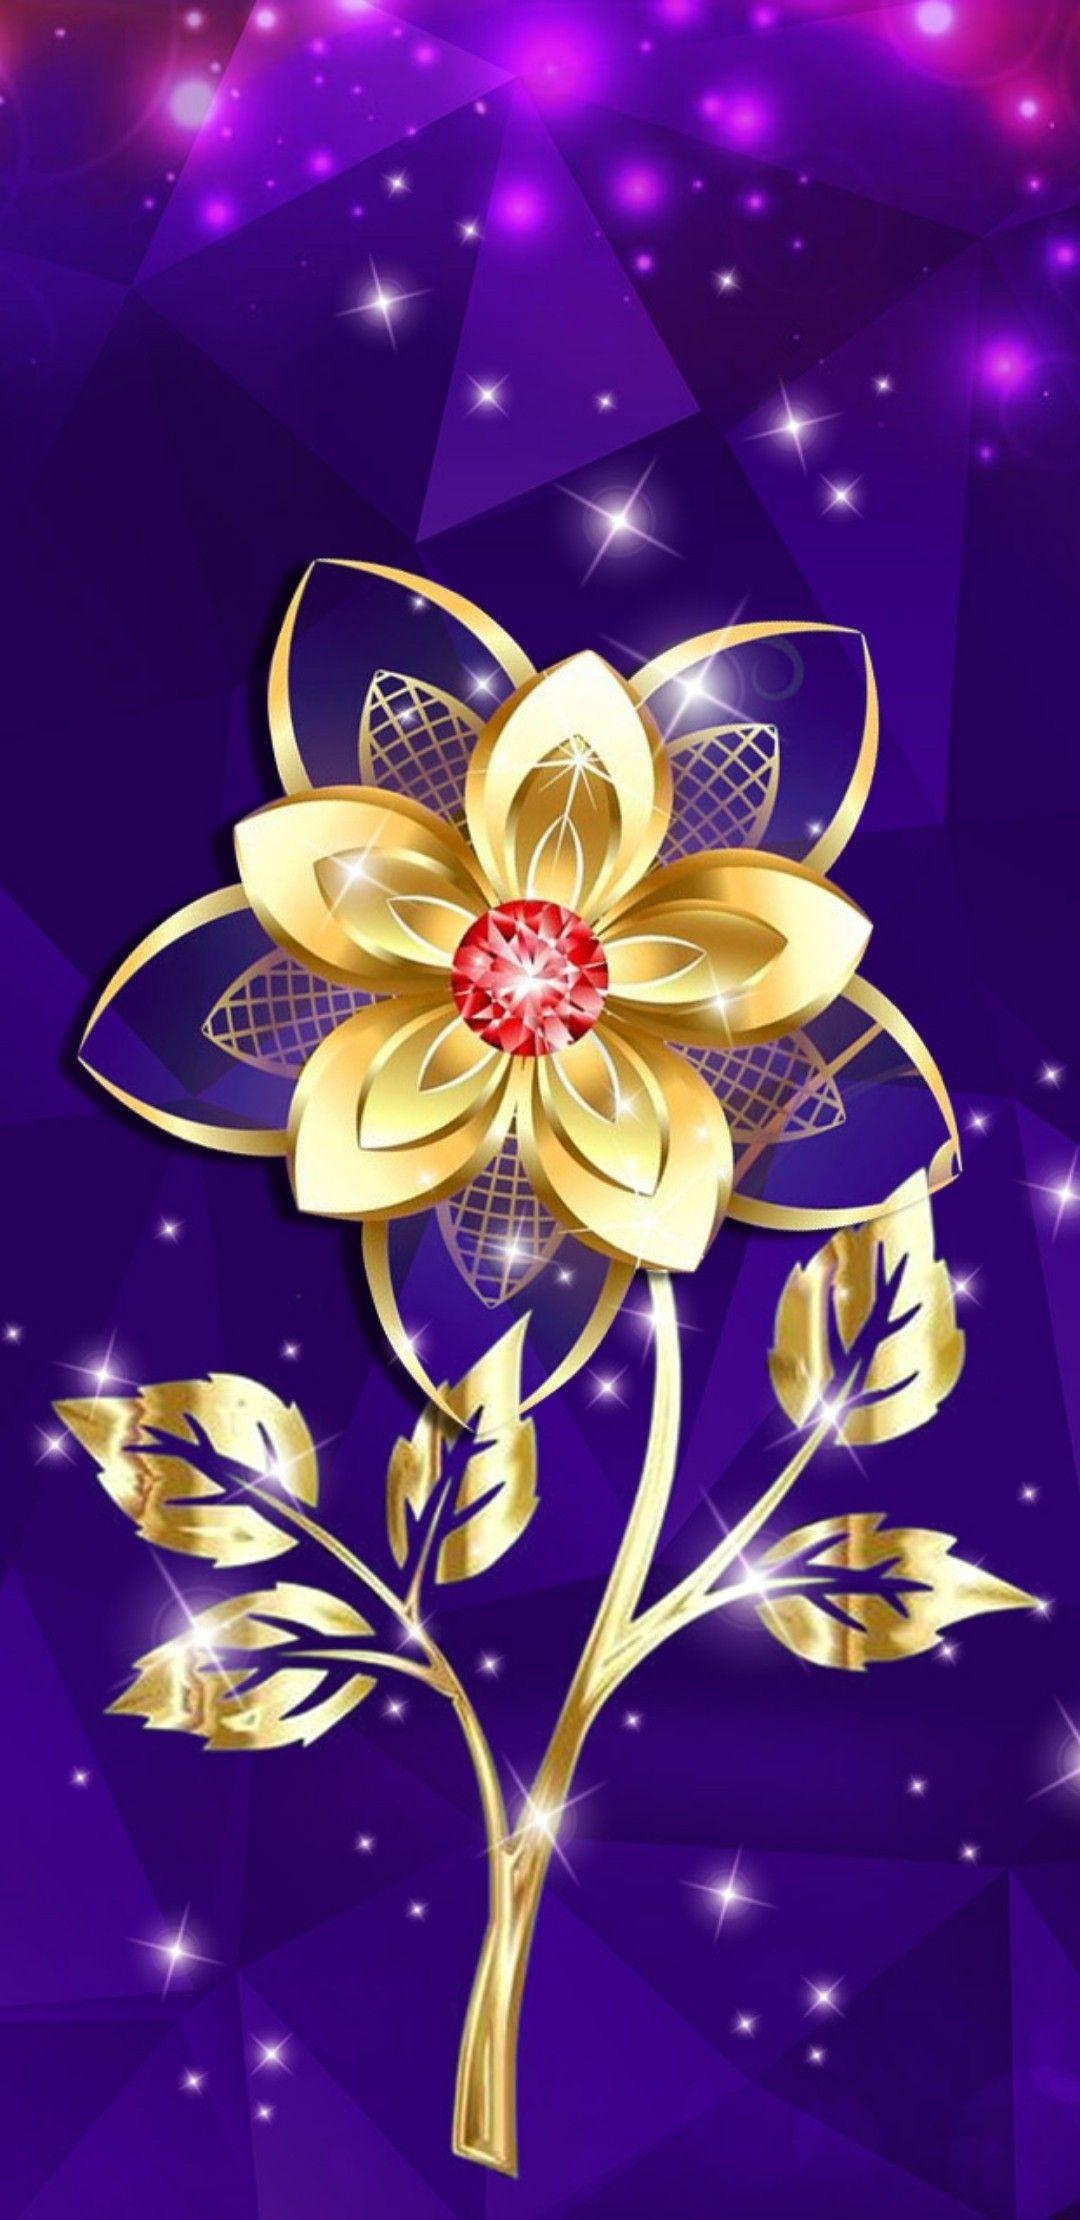 Pin By Barbara Beachum On Flowery Wallpaper 2 Flower Phone Wallpaper Gold Wallpaper Phone Phone Wallpaper